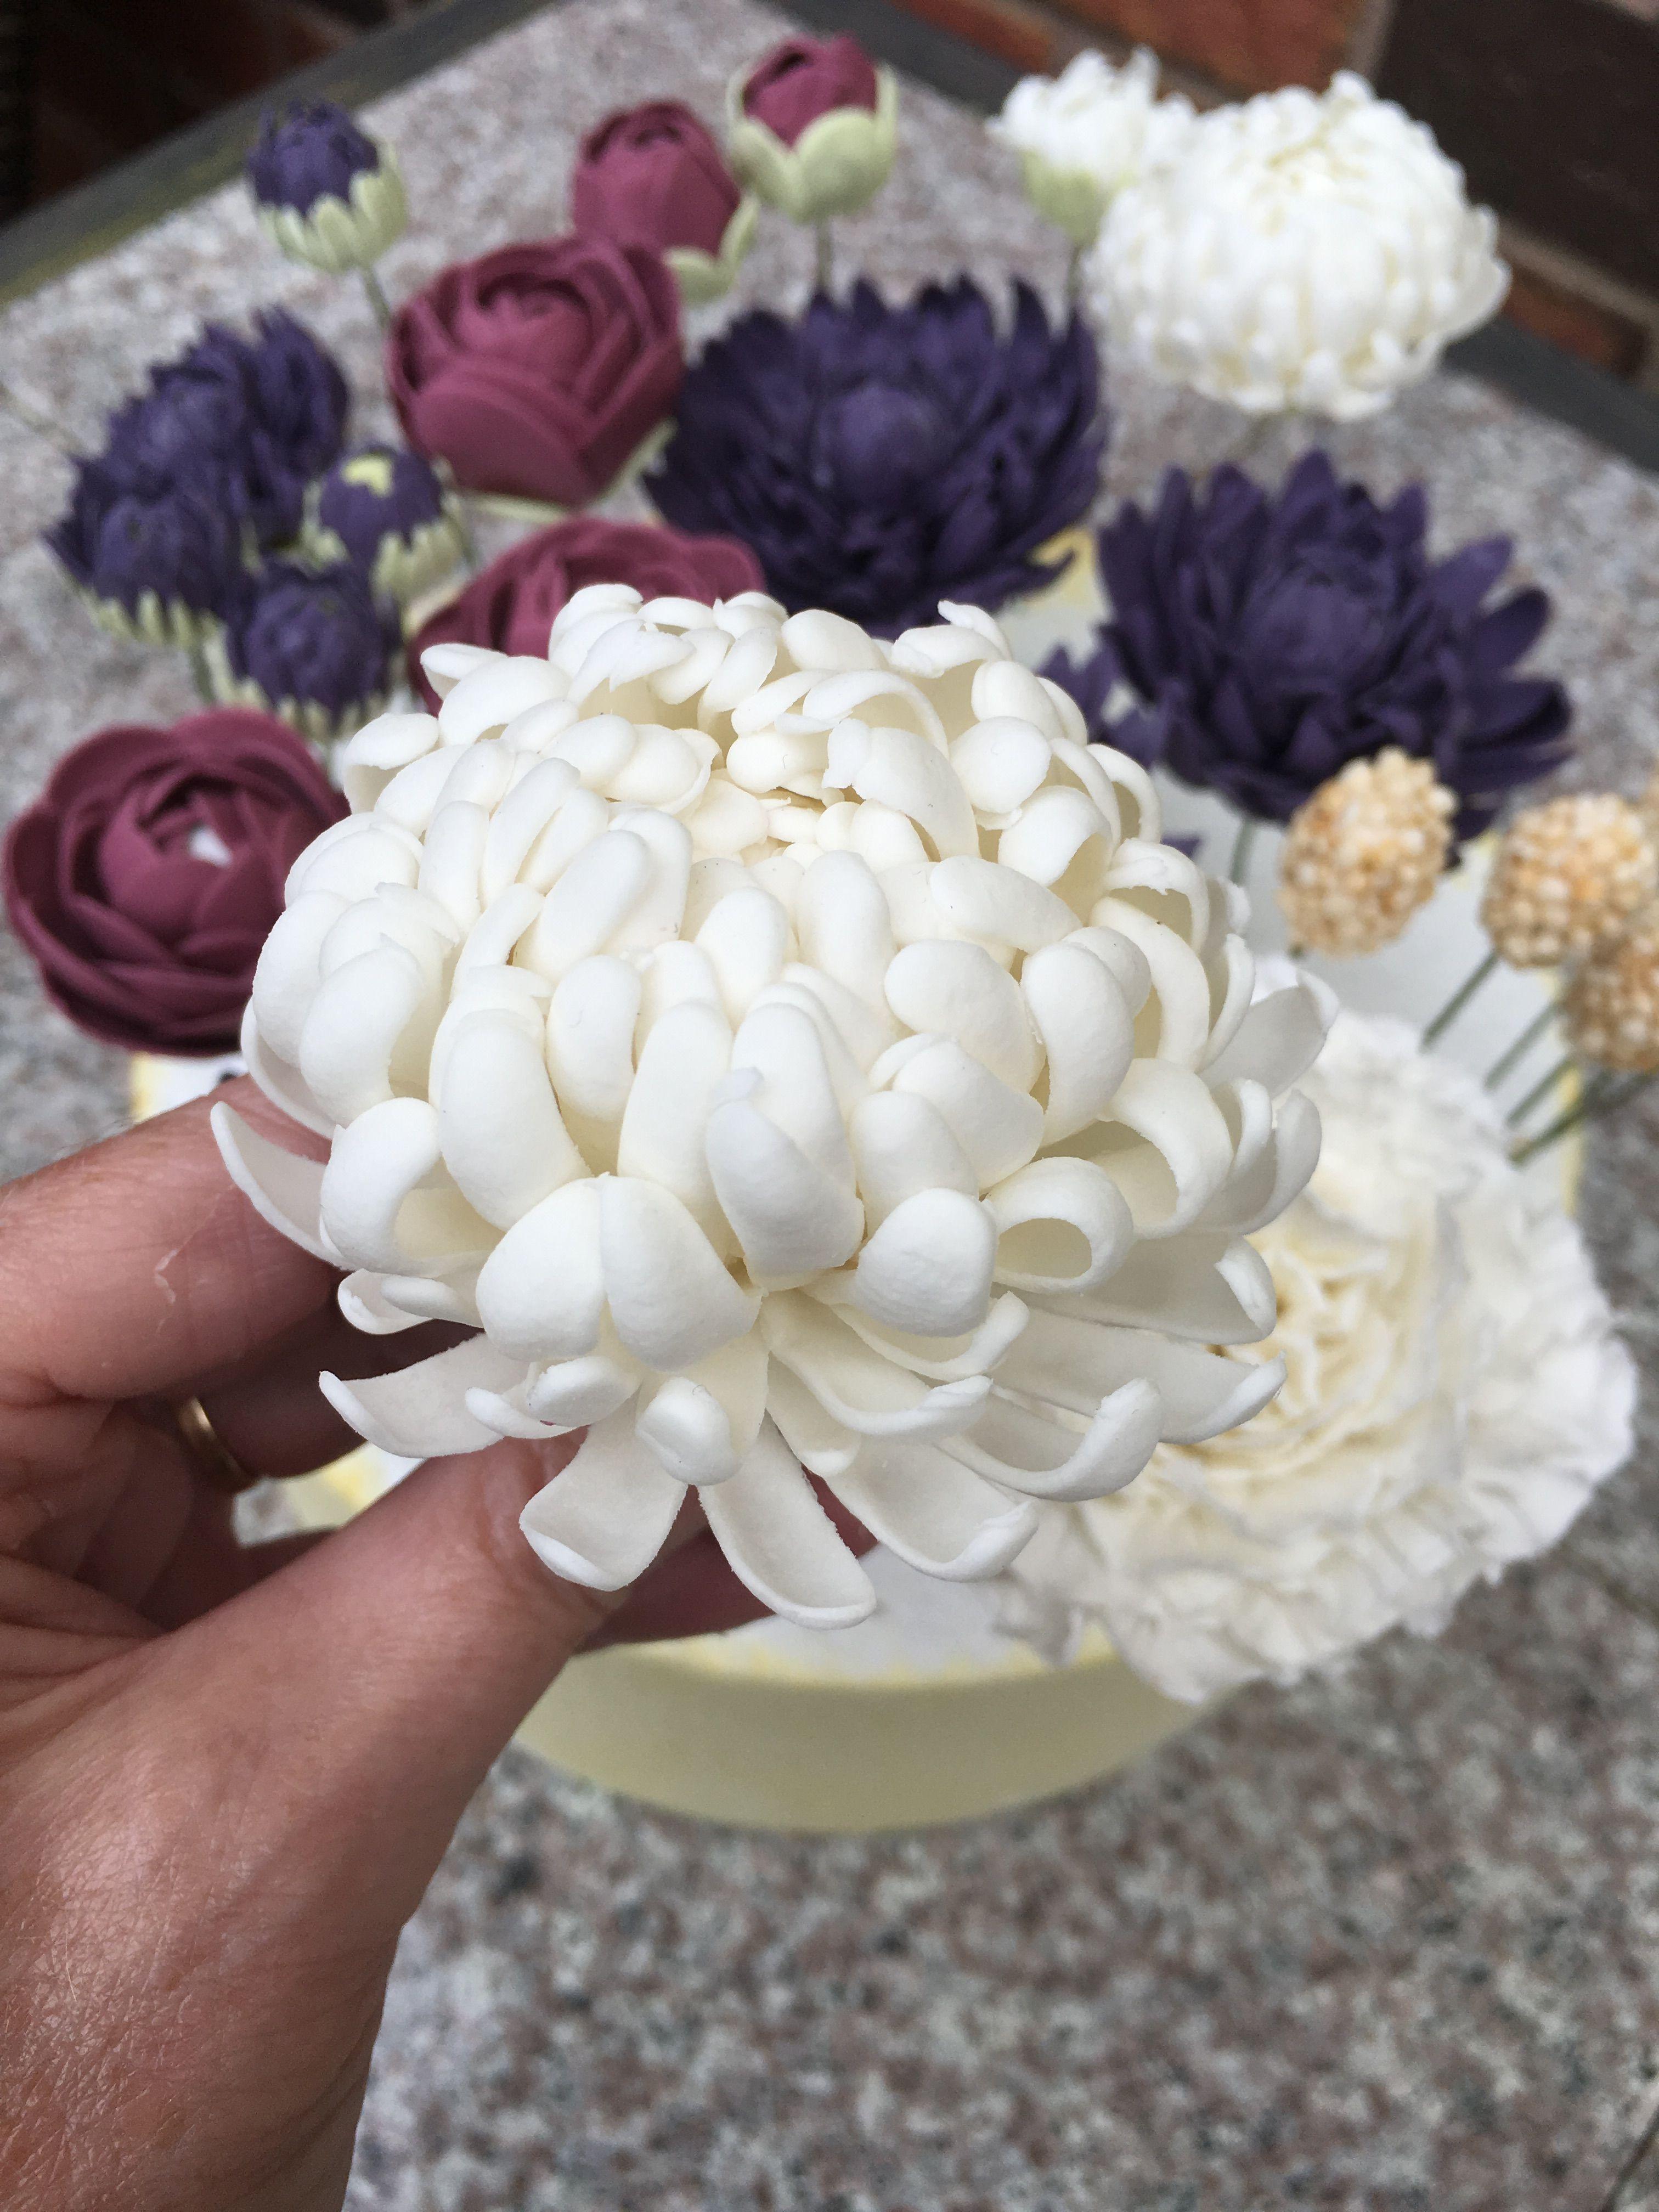 Sugar Flower Chrysanthemum Sugar Flowers Tutorial Cake Decorating Tutorials Sugar Flowers